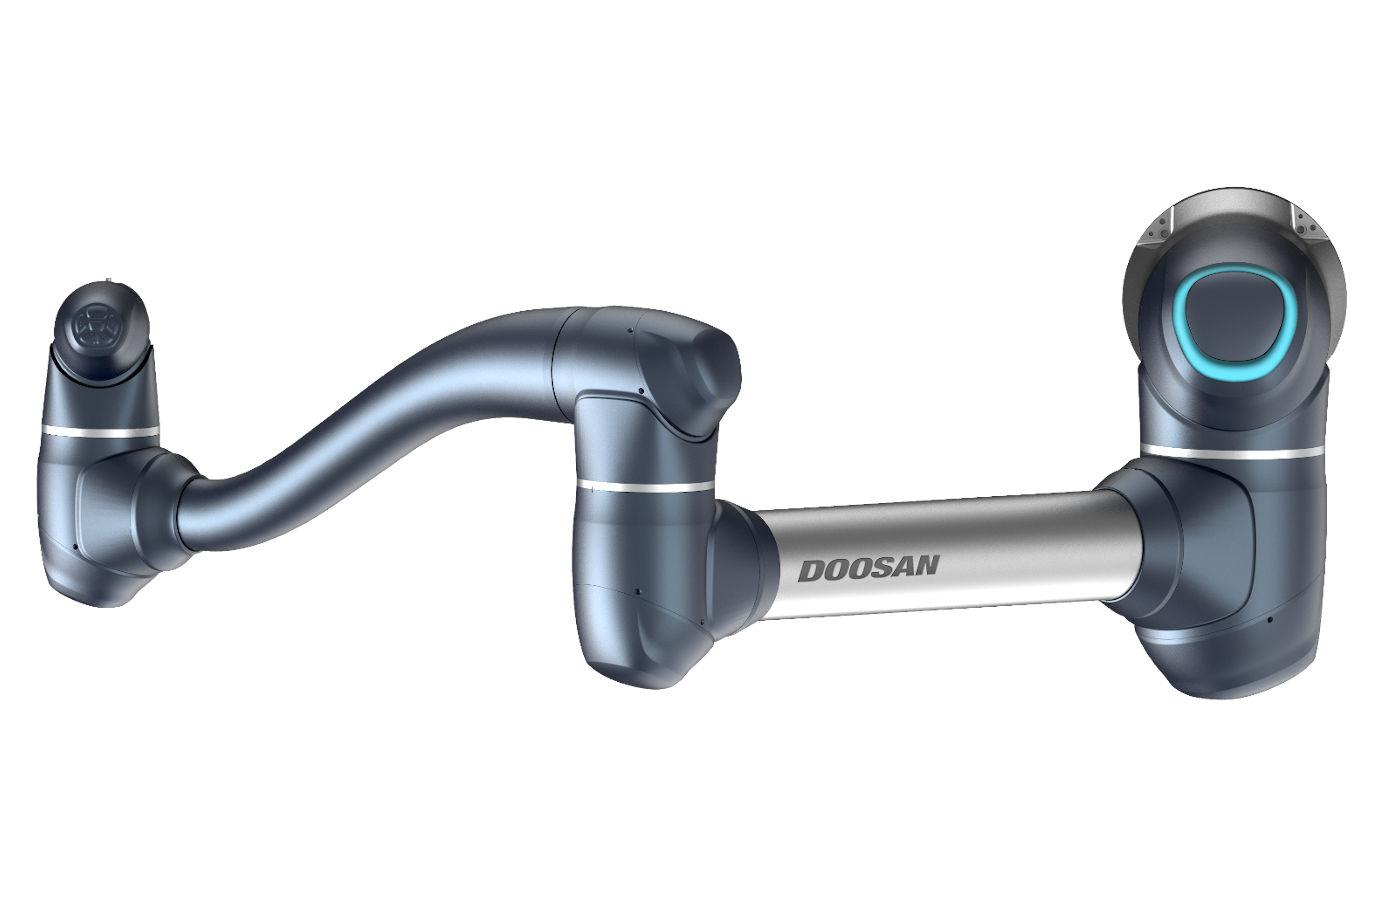 Doosan H-SERIES H2017